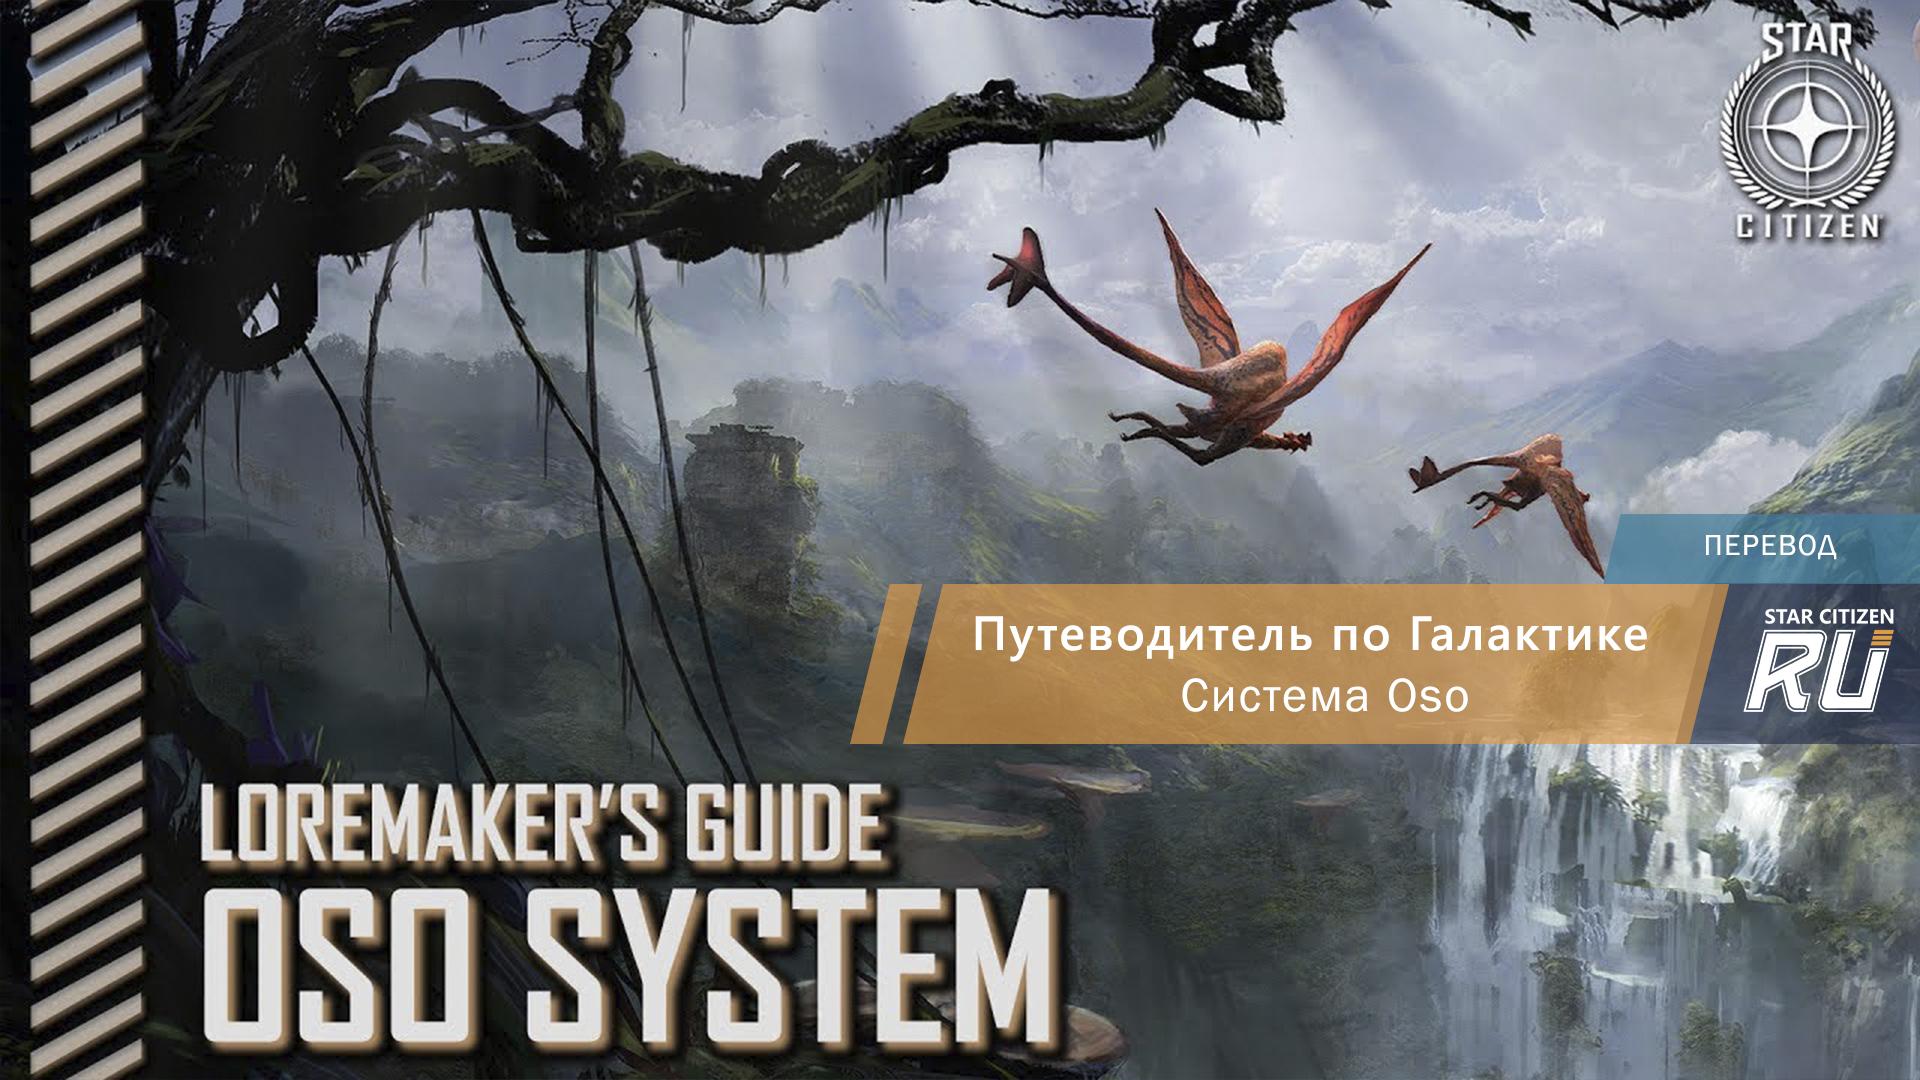 Путеводитель по Галактике: система Oso